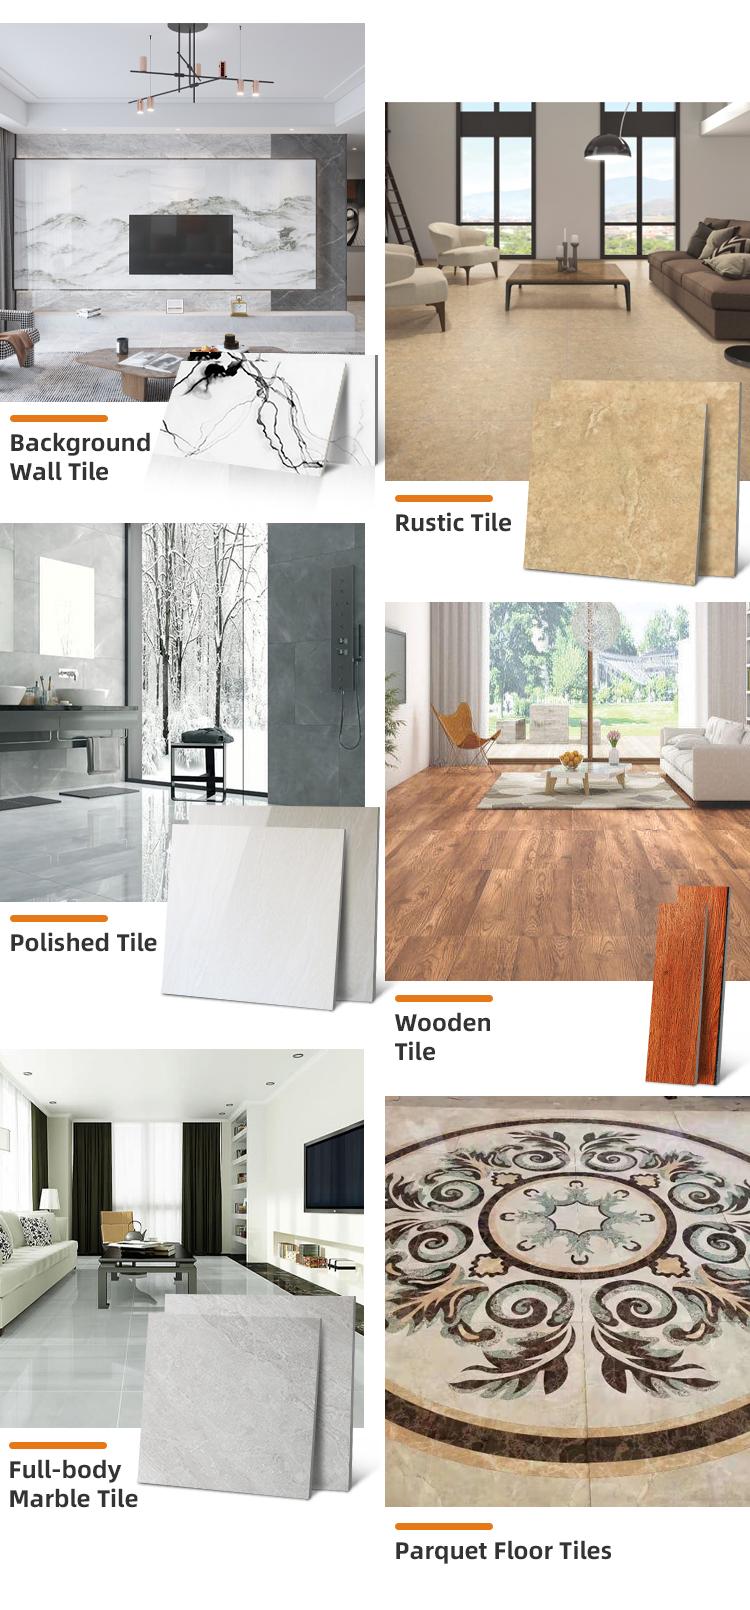 2021 Most Popular High Quality Wear-resistant 800 X 800mm Floor Tiles Wear-resistant Hotel Bathroom